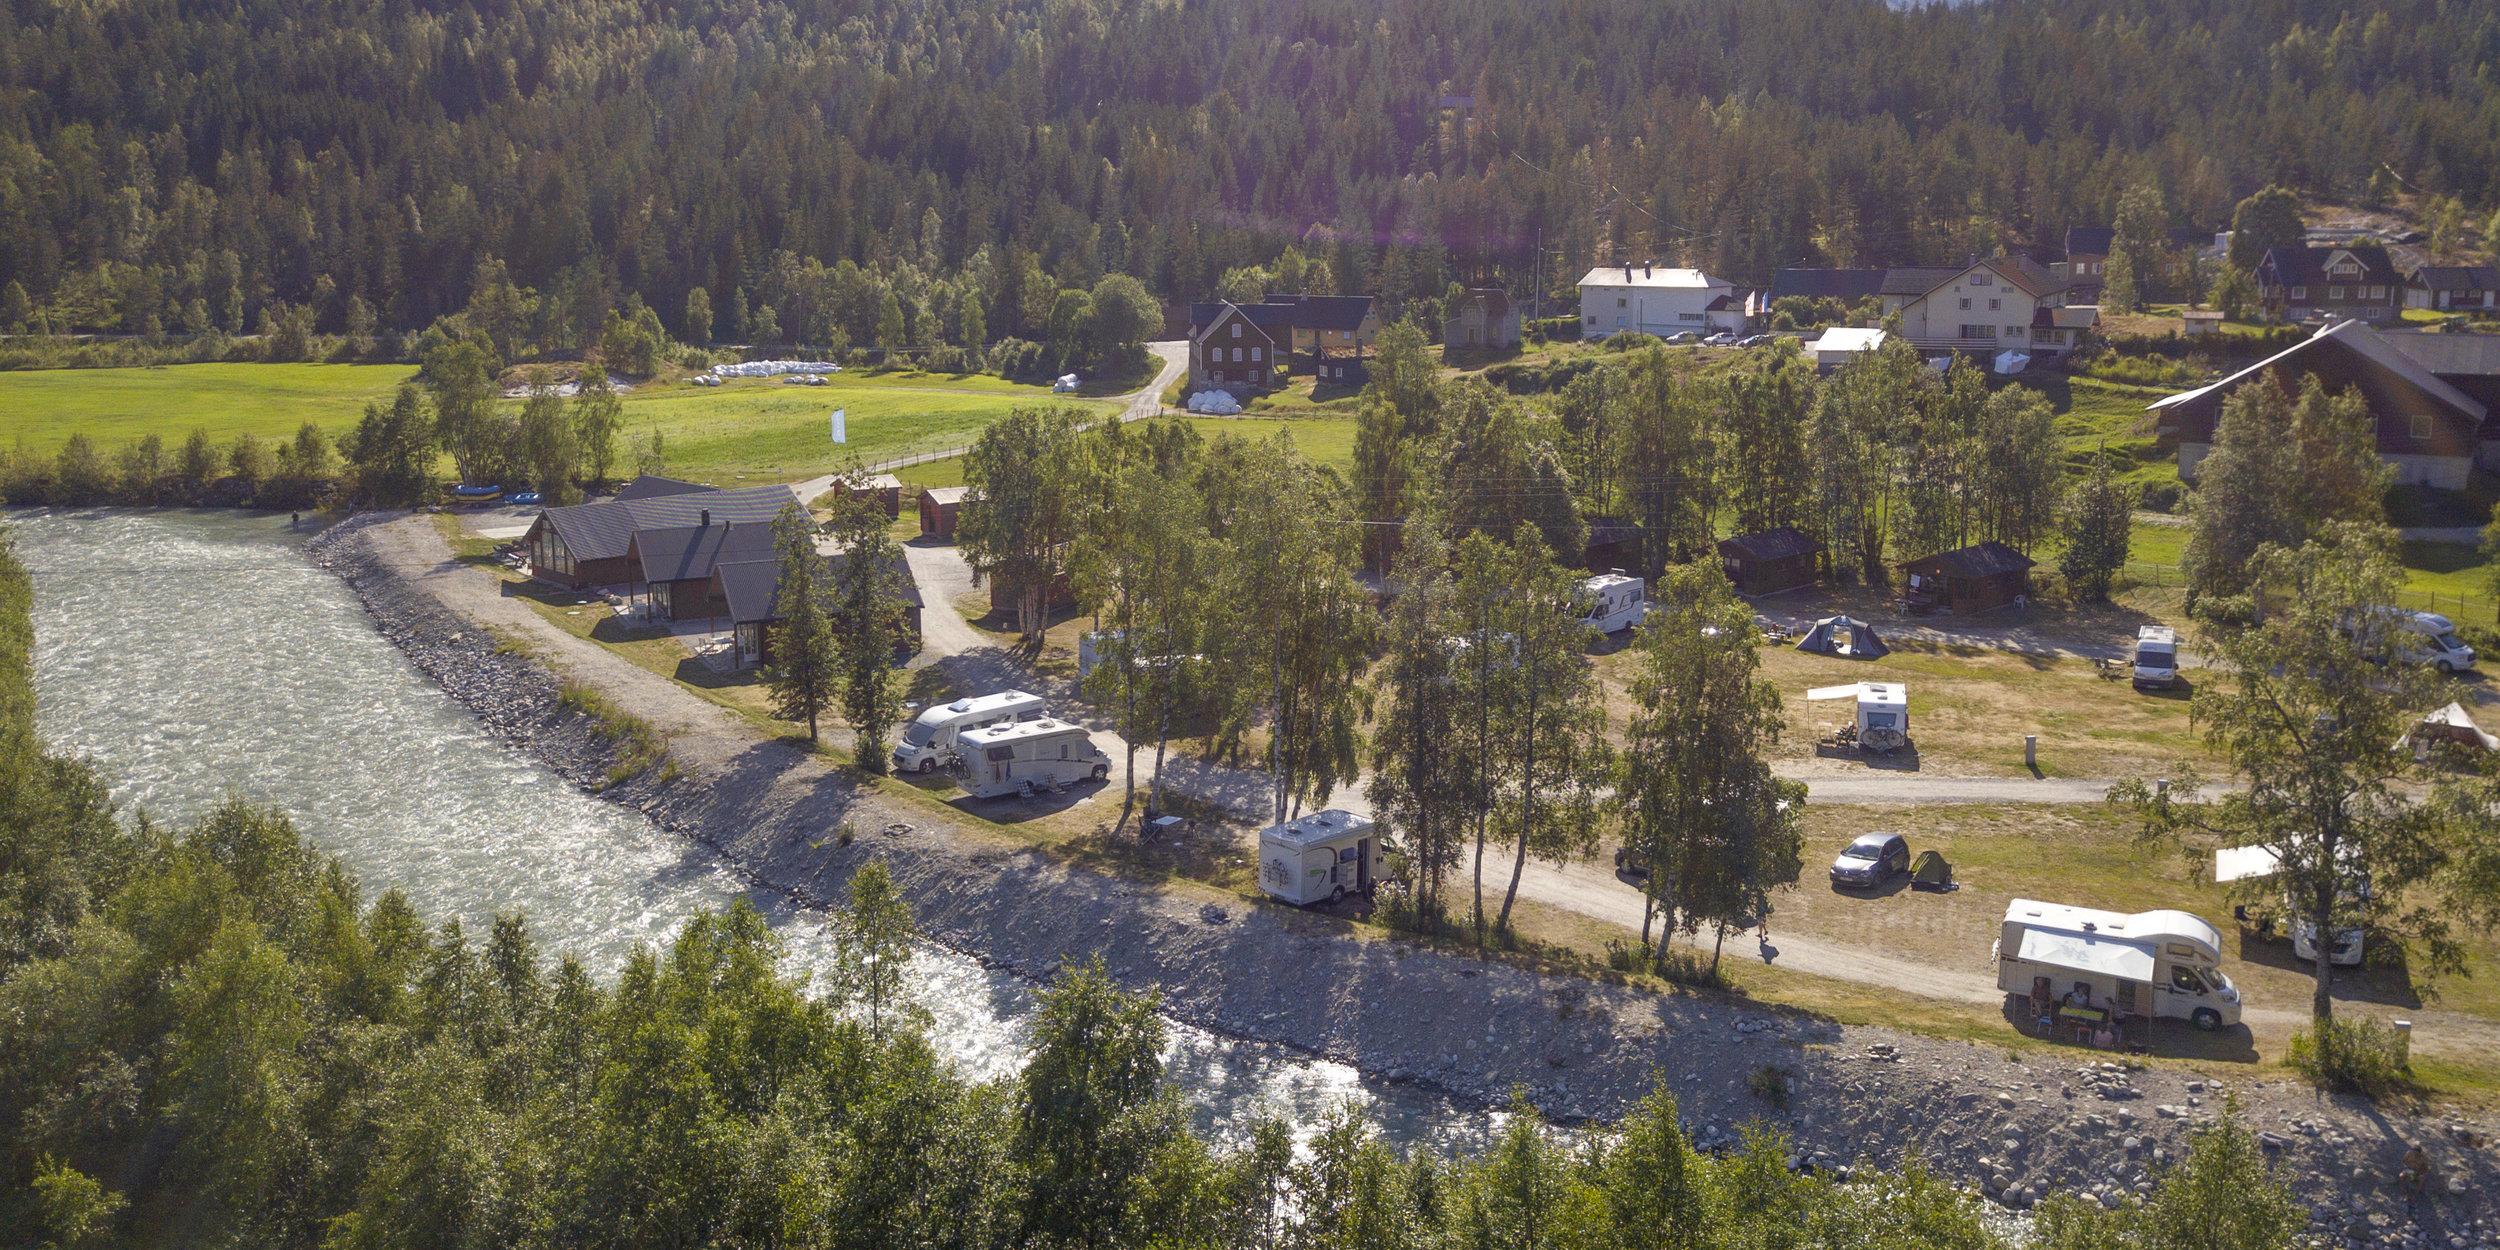 Jostedal_Camping_Foto_1.jpg